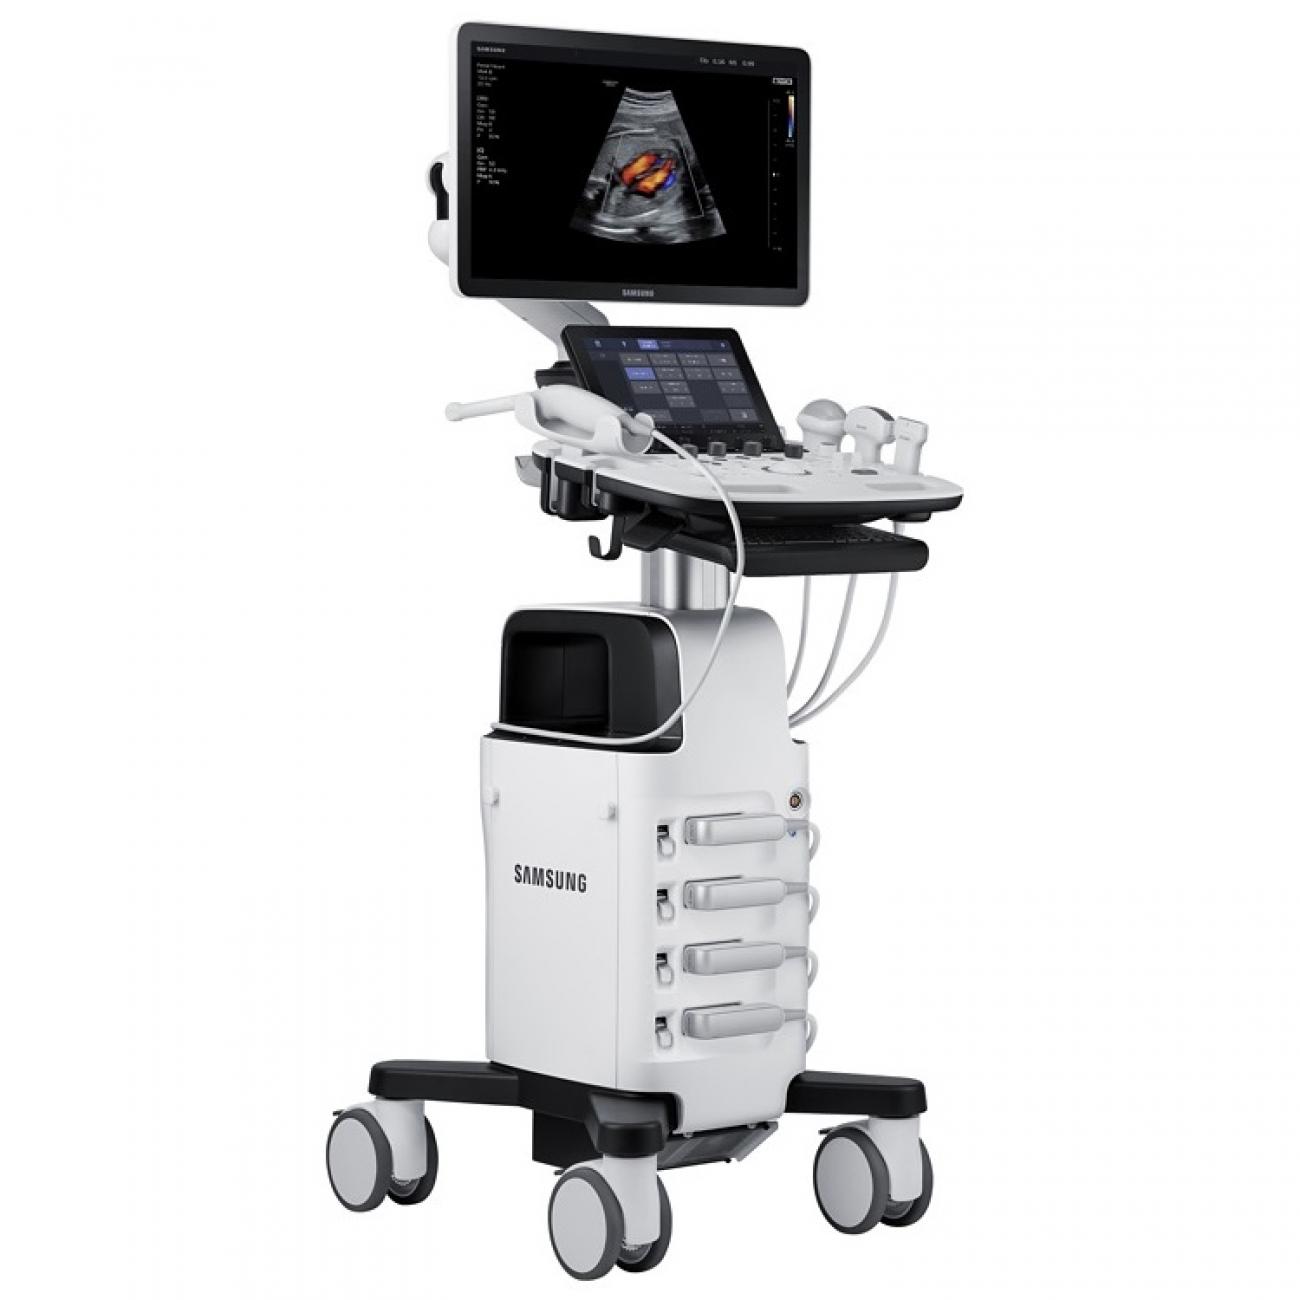 Samsung Medison HS40